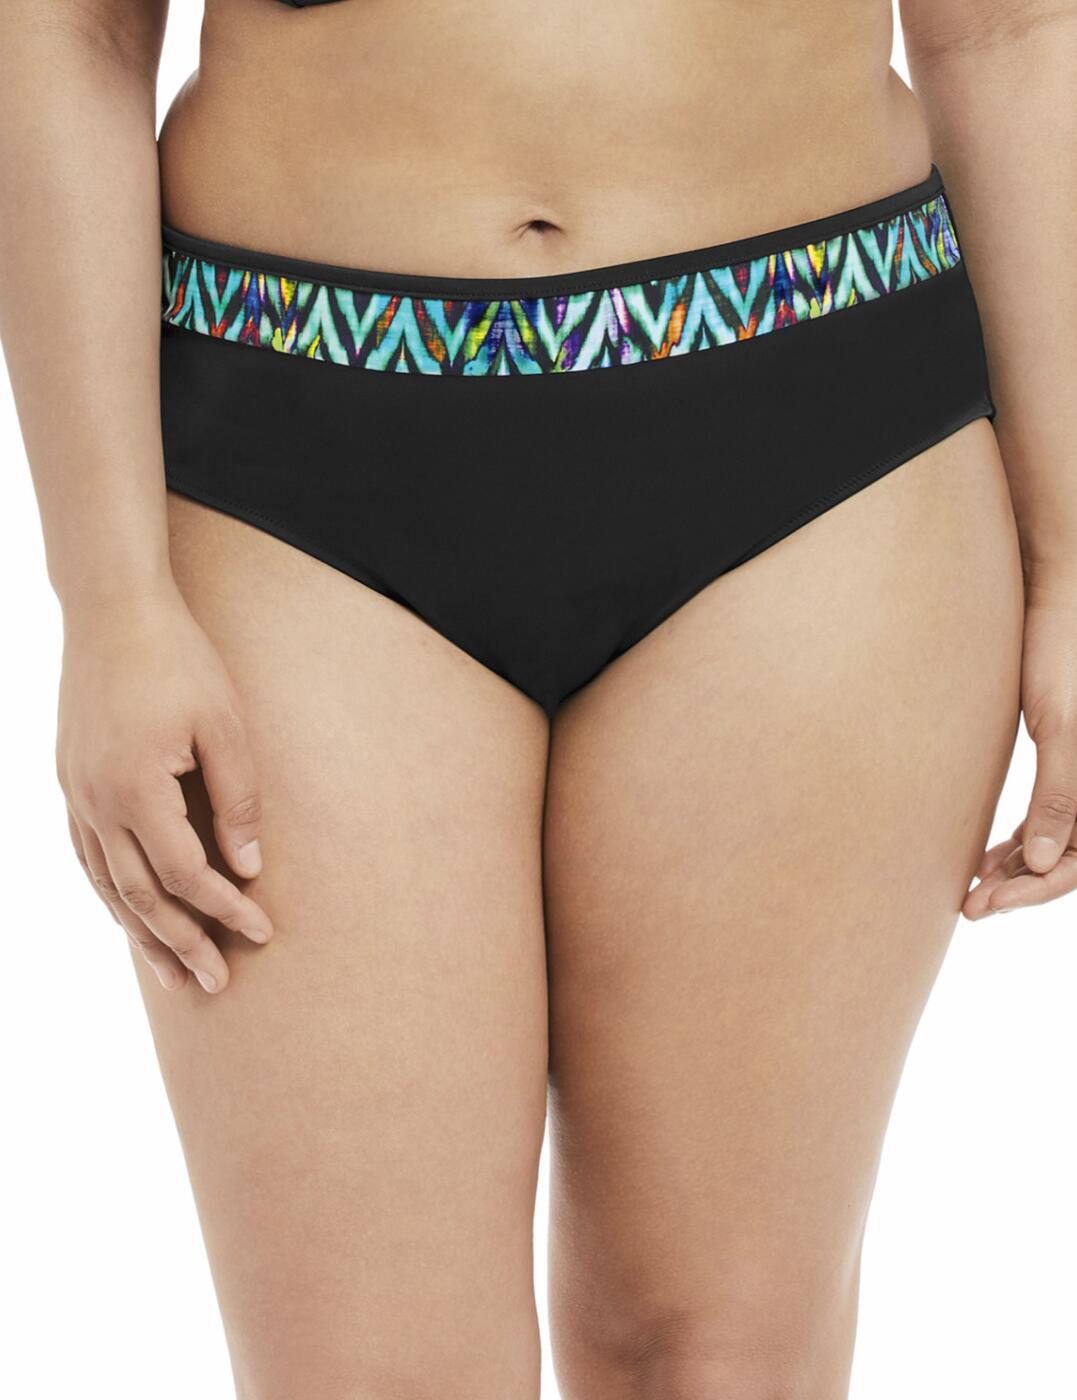 7114 Elomi Tribal Instinct Mid Rise Bikini Brief Black - 7114 Bikini Brief